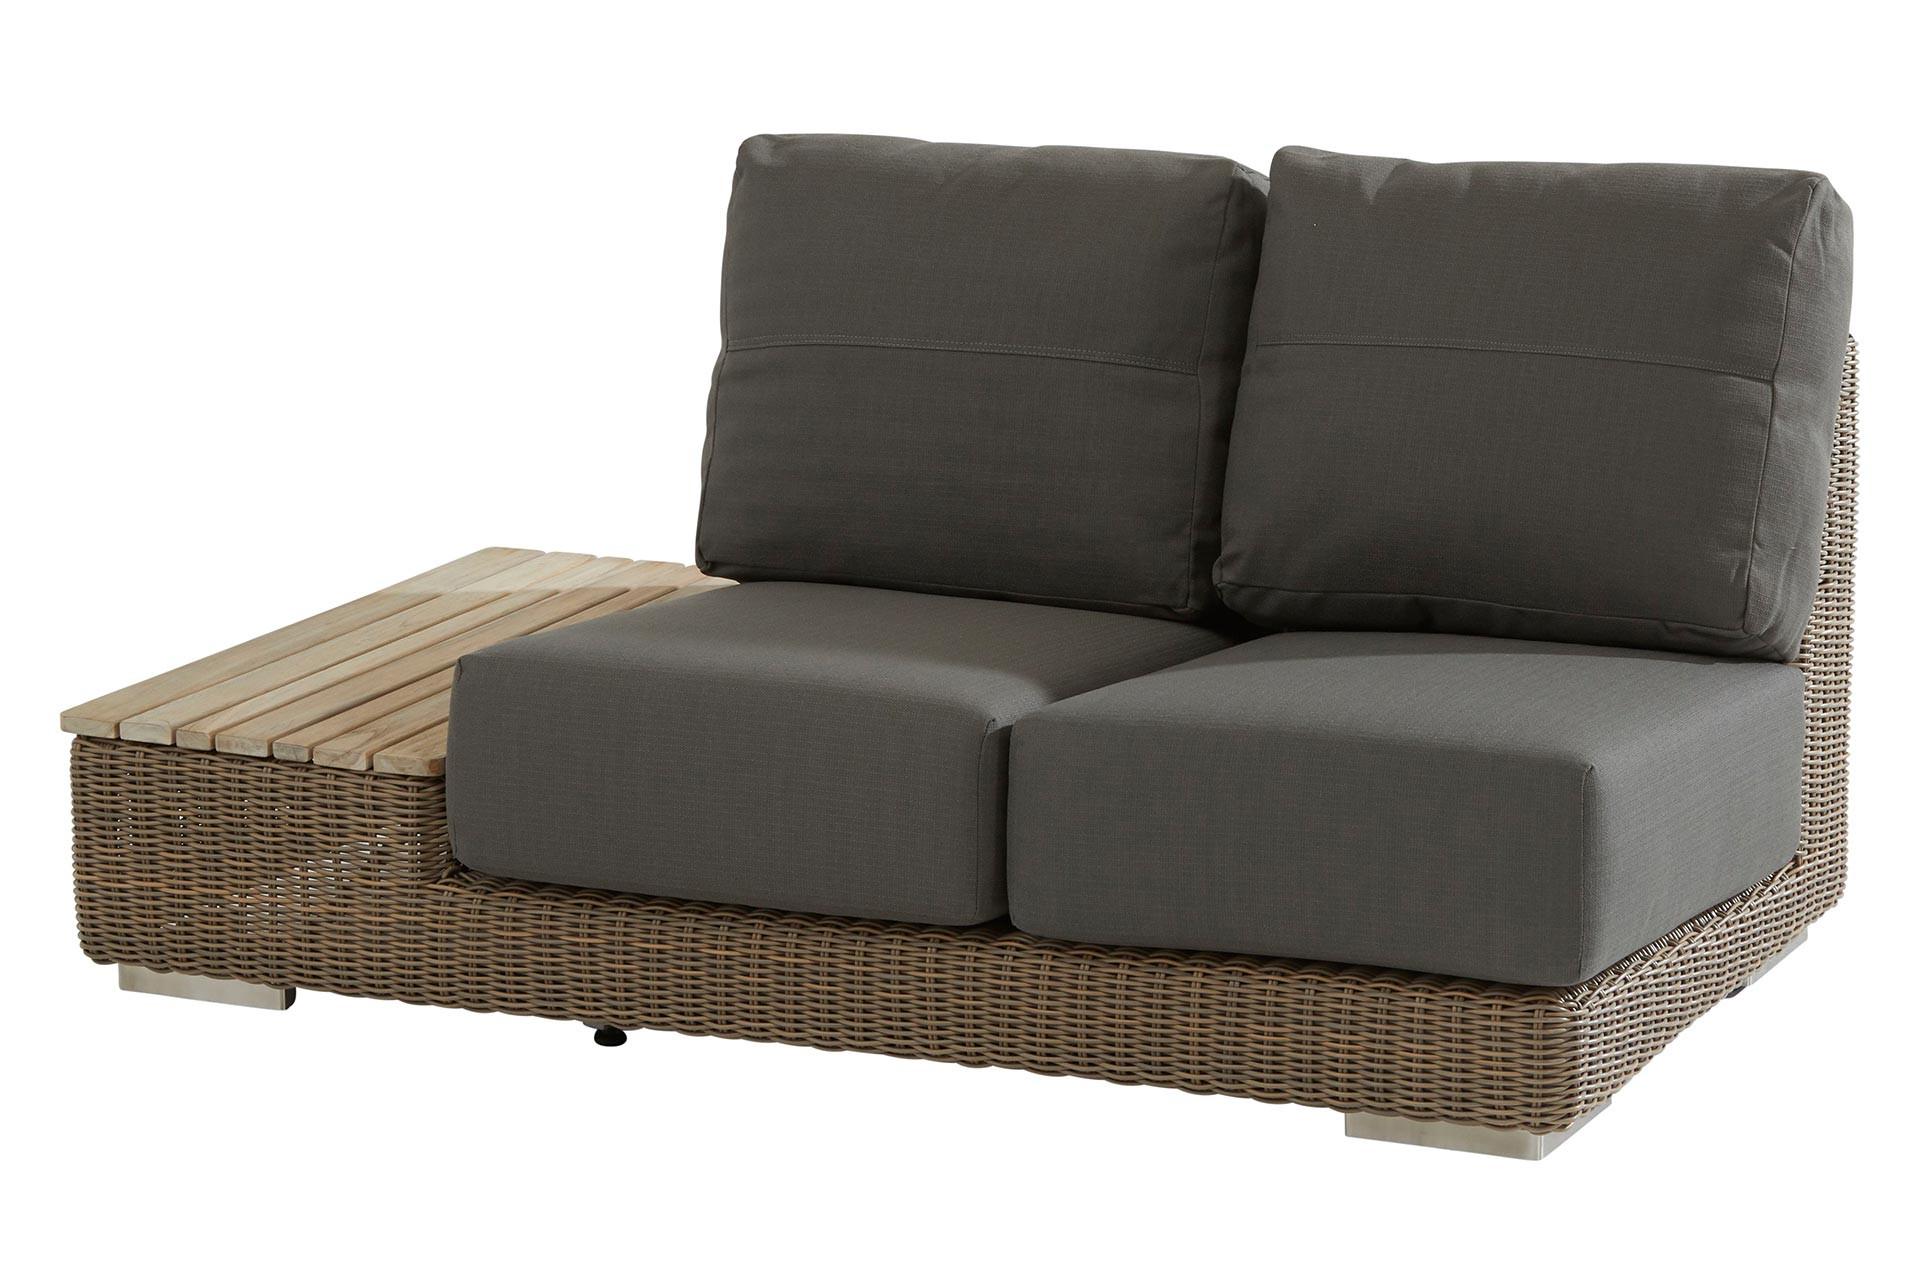 Kingston modular 2 seater right island teak with 4 cushions